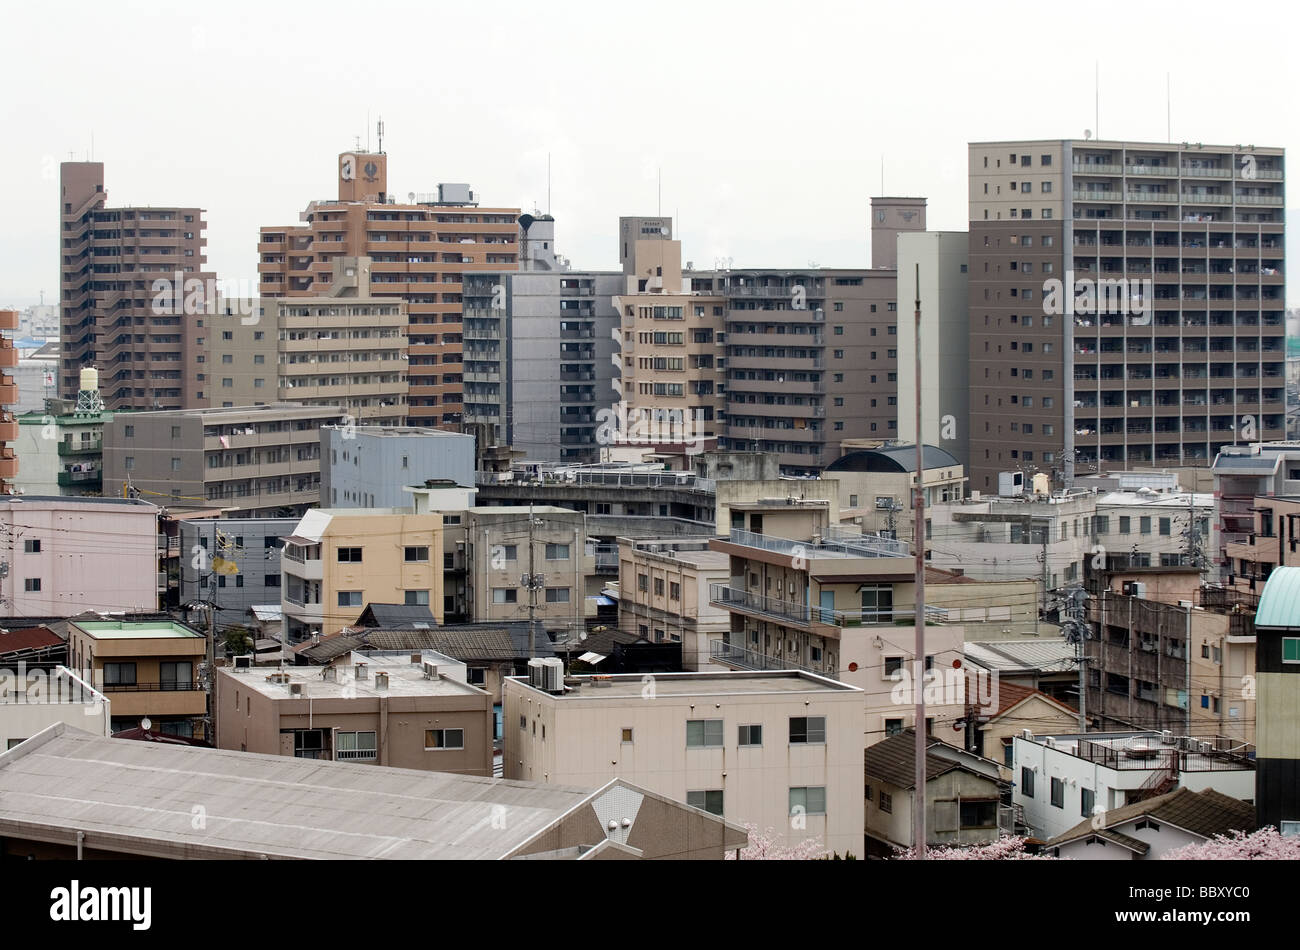 High Rise Apartment Buildings Create A Backdrop To A Sea Of Small - Small apartment buildings